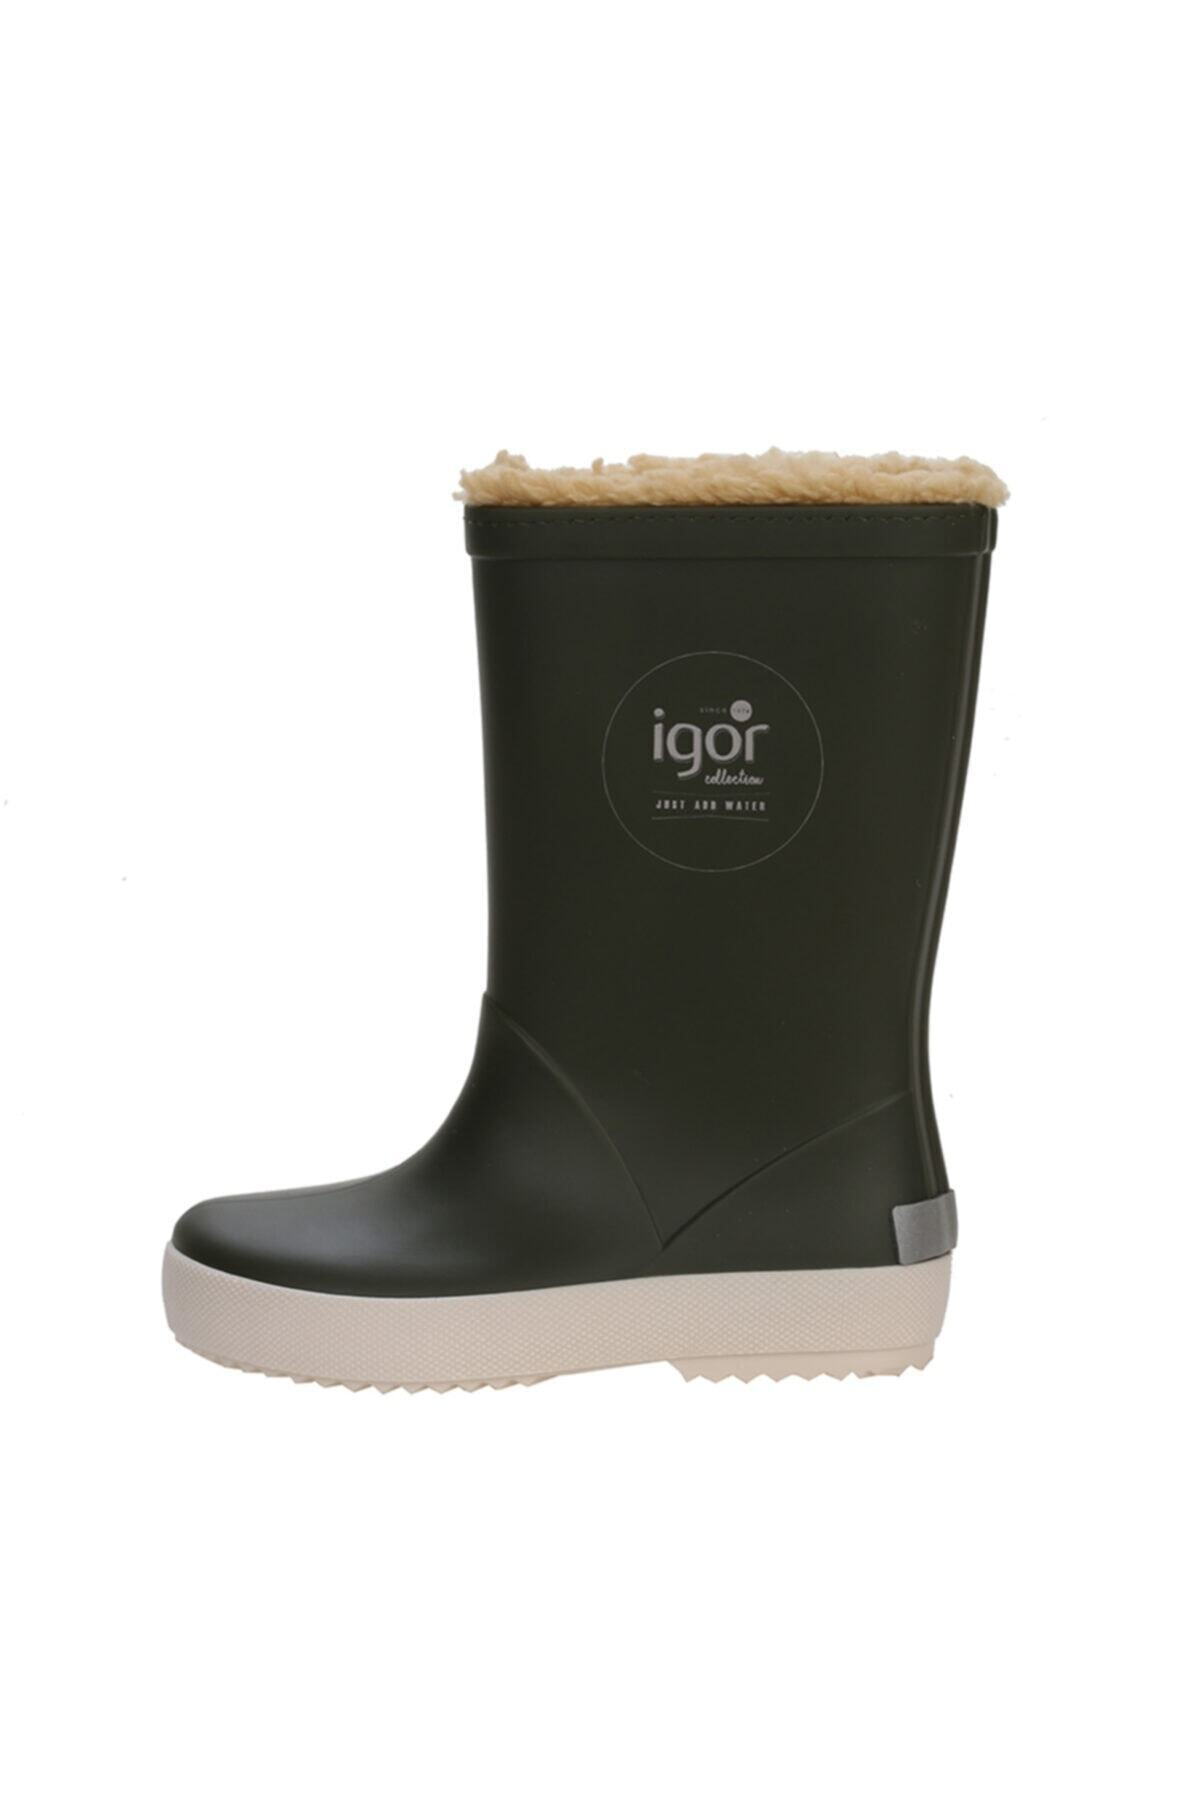 IGOR Splash Nautico Borreguito Yağmur Çizmesi 1